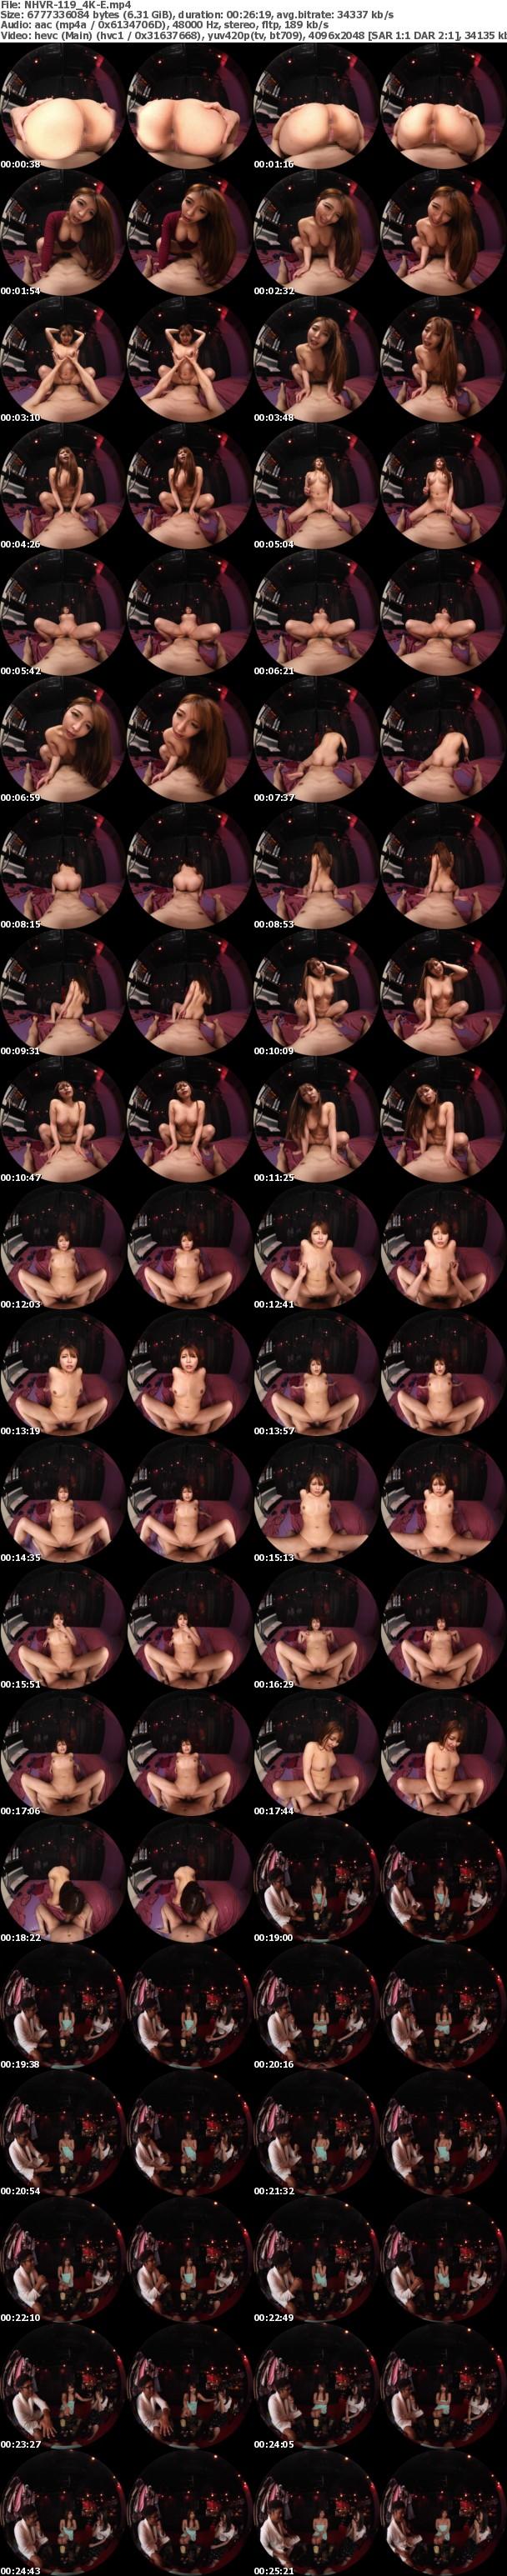 (VR) (4K) NHVR-119 歌舞伎町C店全面協力!本物店舗で撮影した超リアルハプニングバー体験 VR ~ハプバーの女神つむぎちゃんを落とすのは誰だ!?~